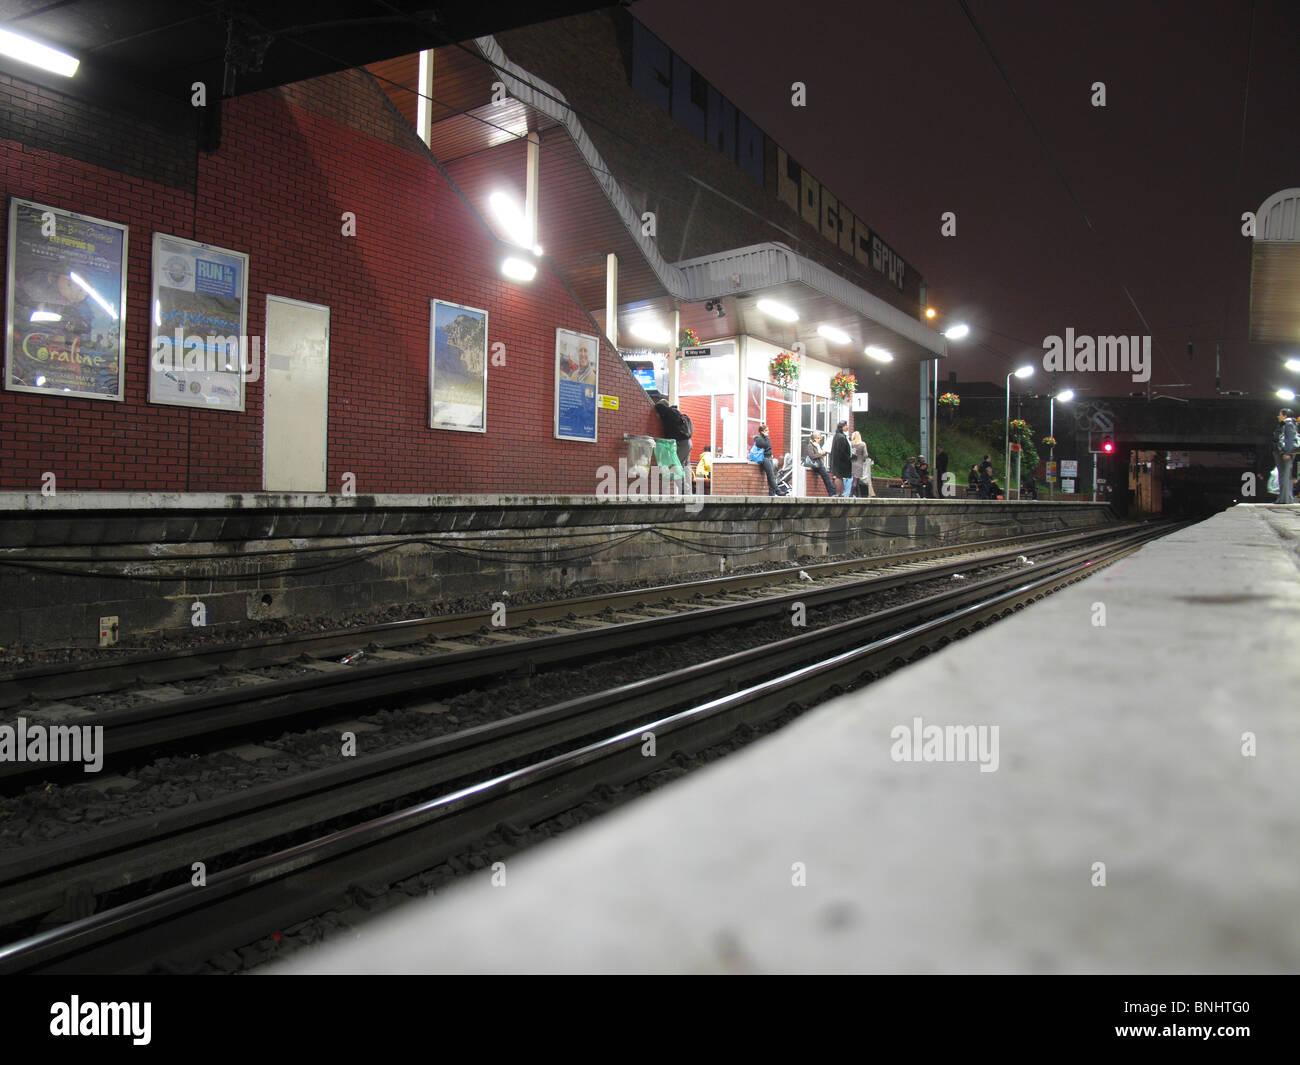 London Overground Dalston Kingsland Station at night - Stock Image